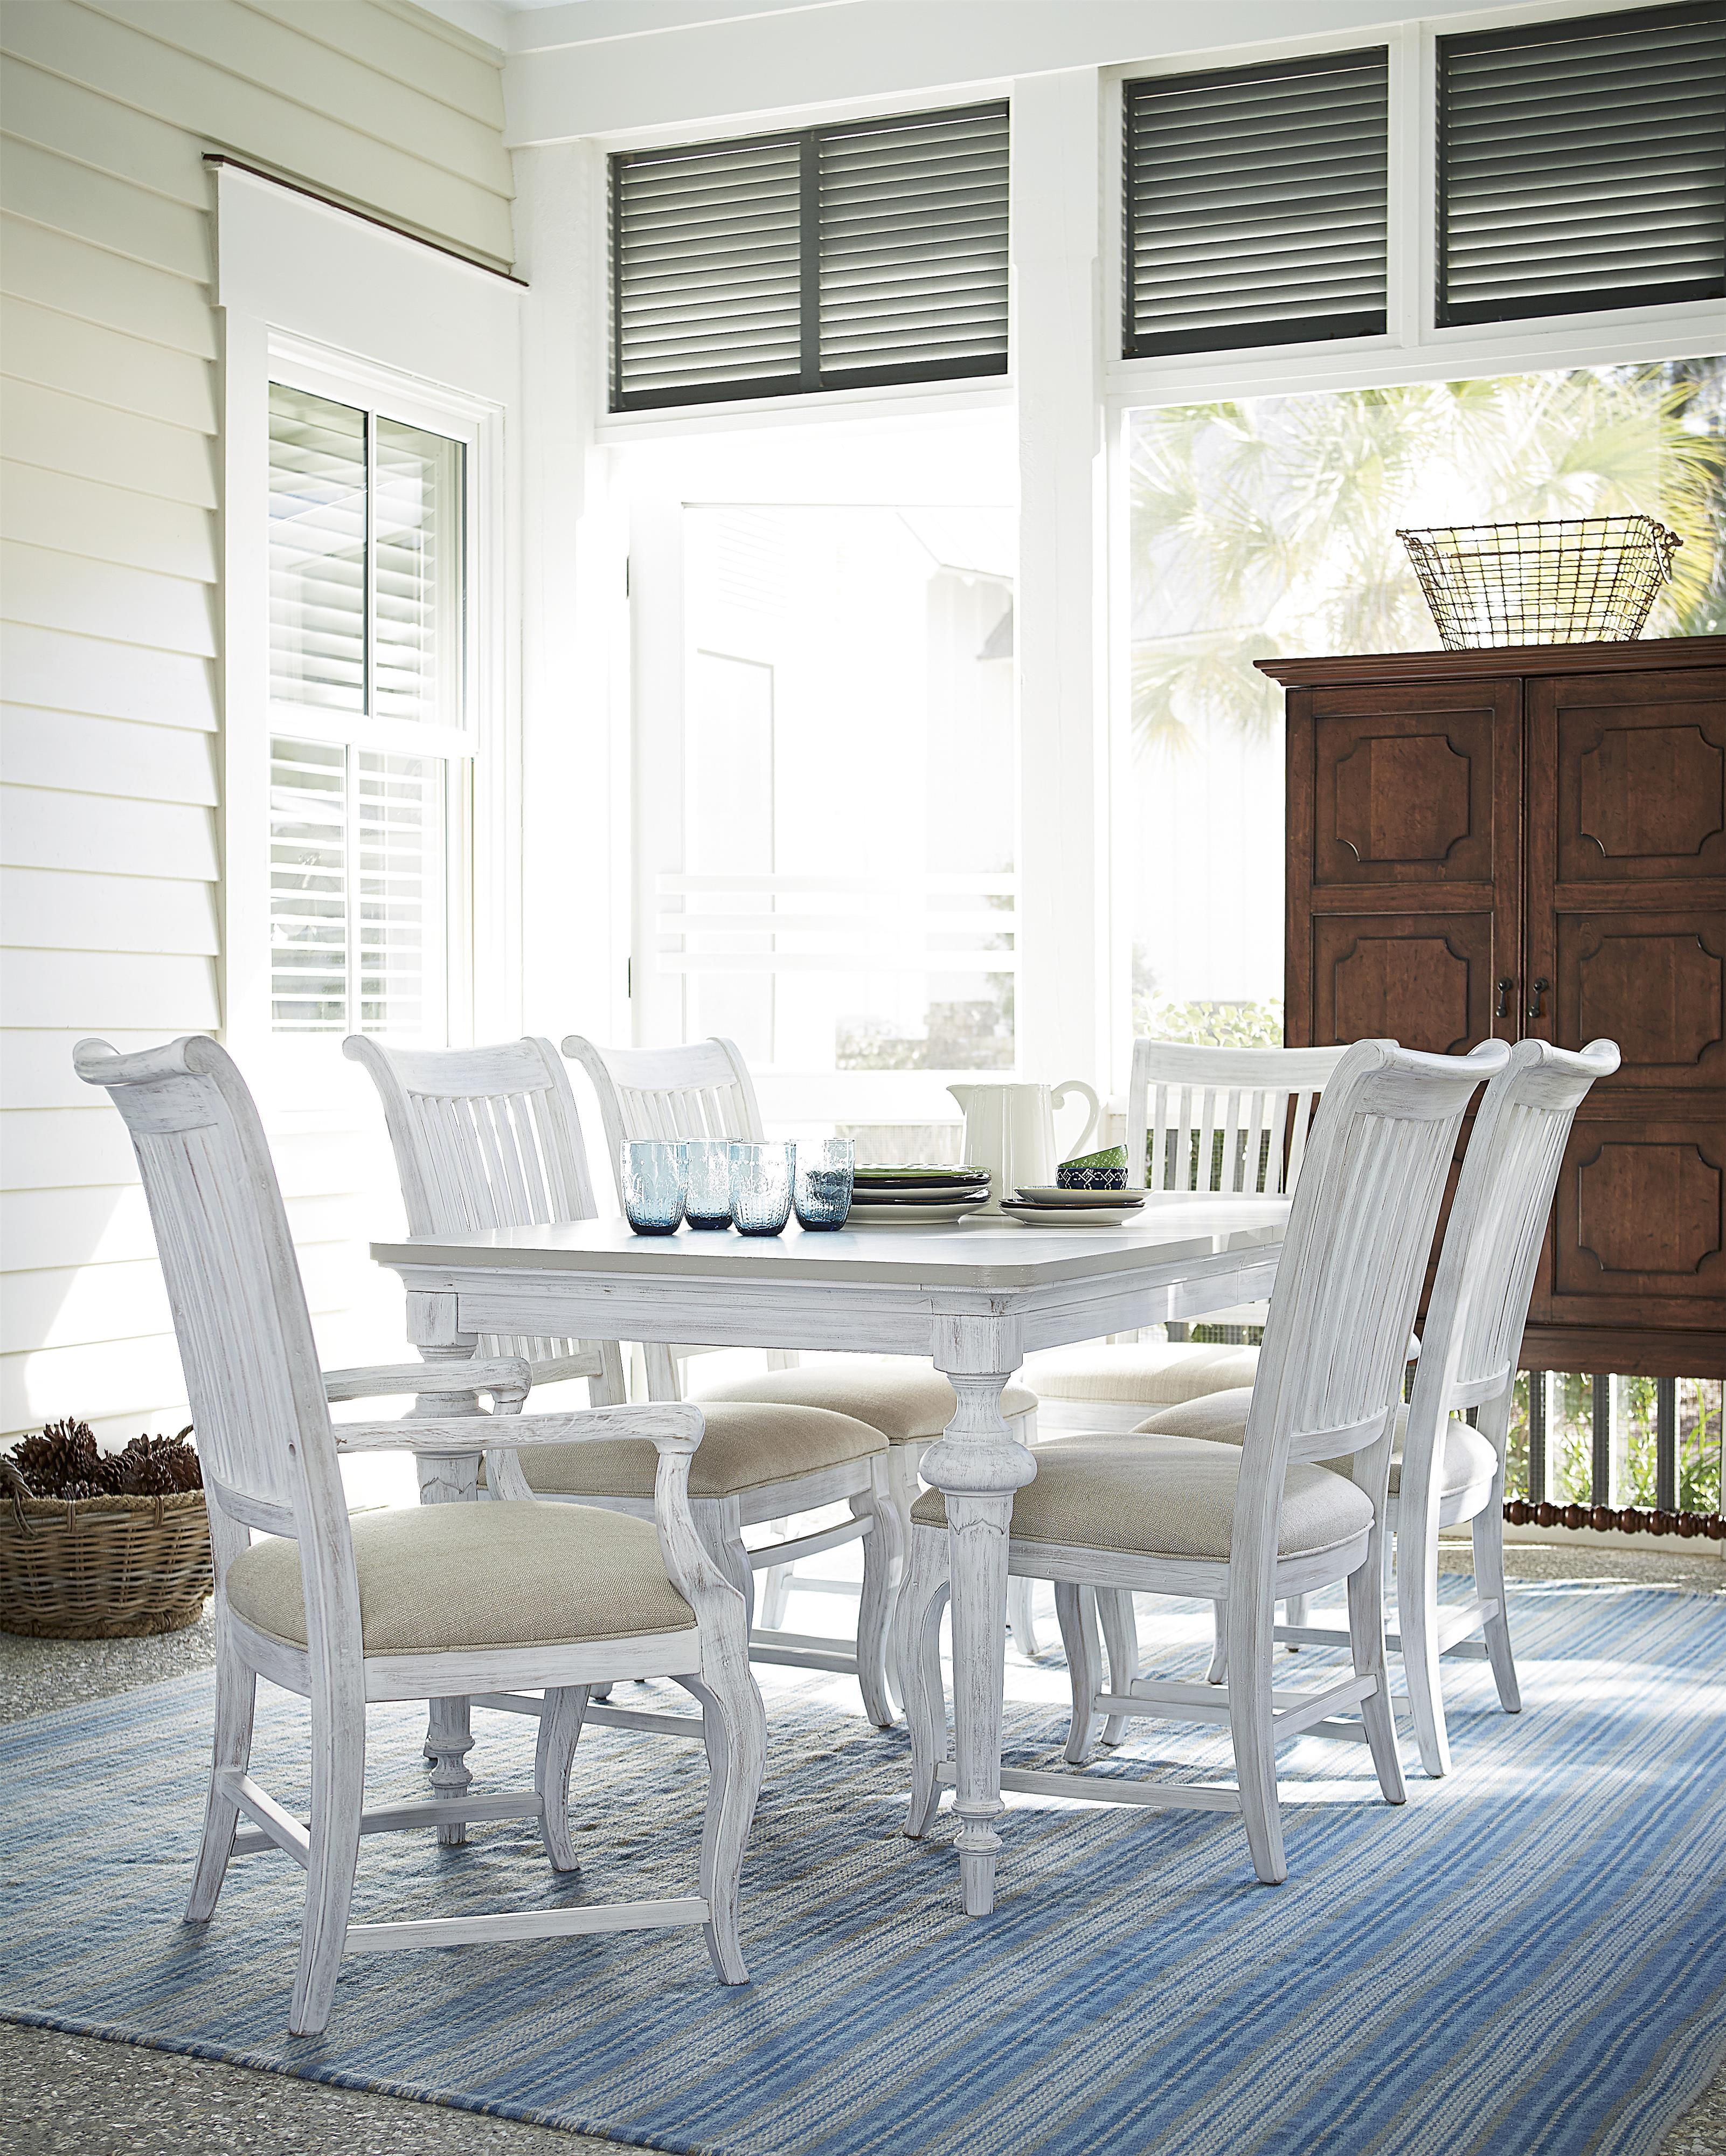 Paula Deen Dining Room: Paula Deen By Universal Dogwood Dogwood Side Chair With